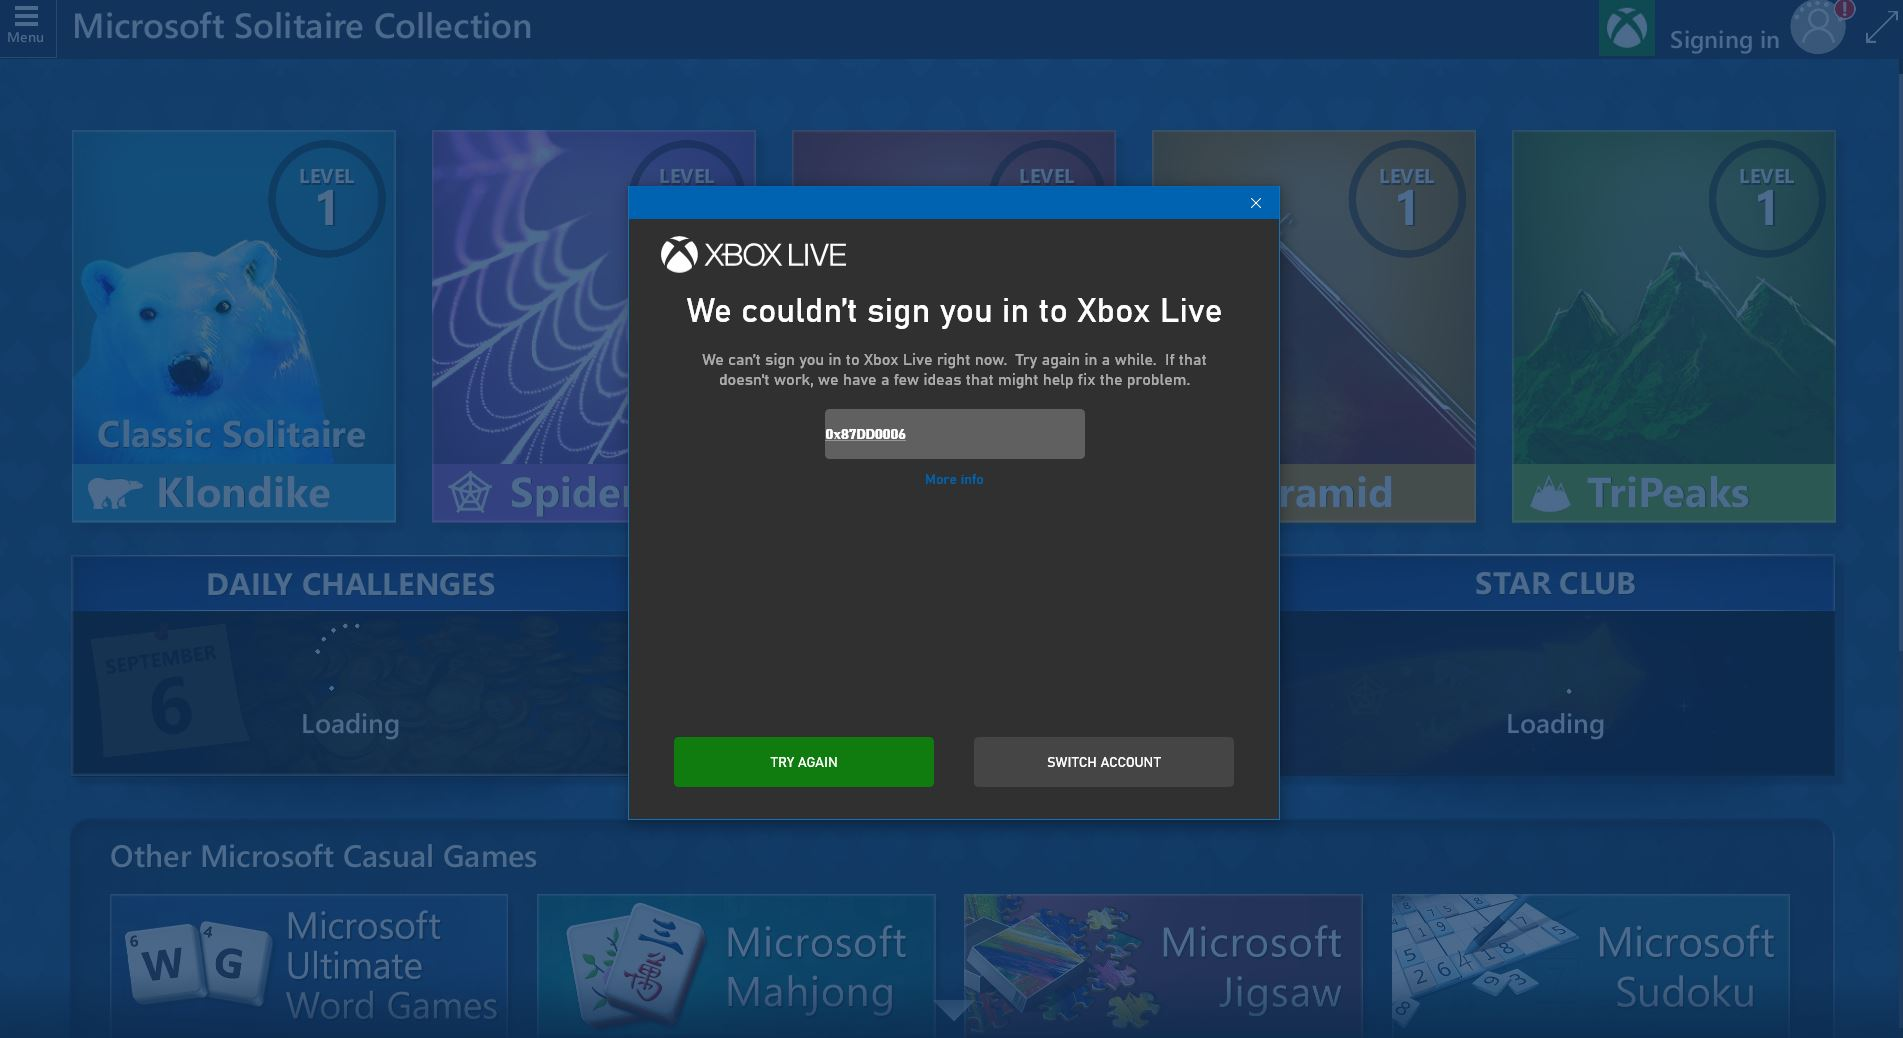 Problem with Microsoft Solitare Collection. cbe66214-d082-43f4-9bc4-445ea723f81b?upload=true.jpg